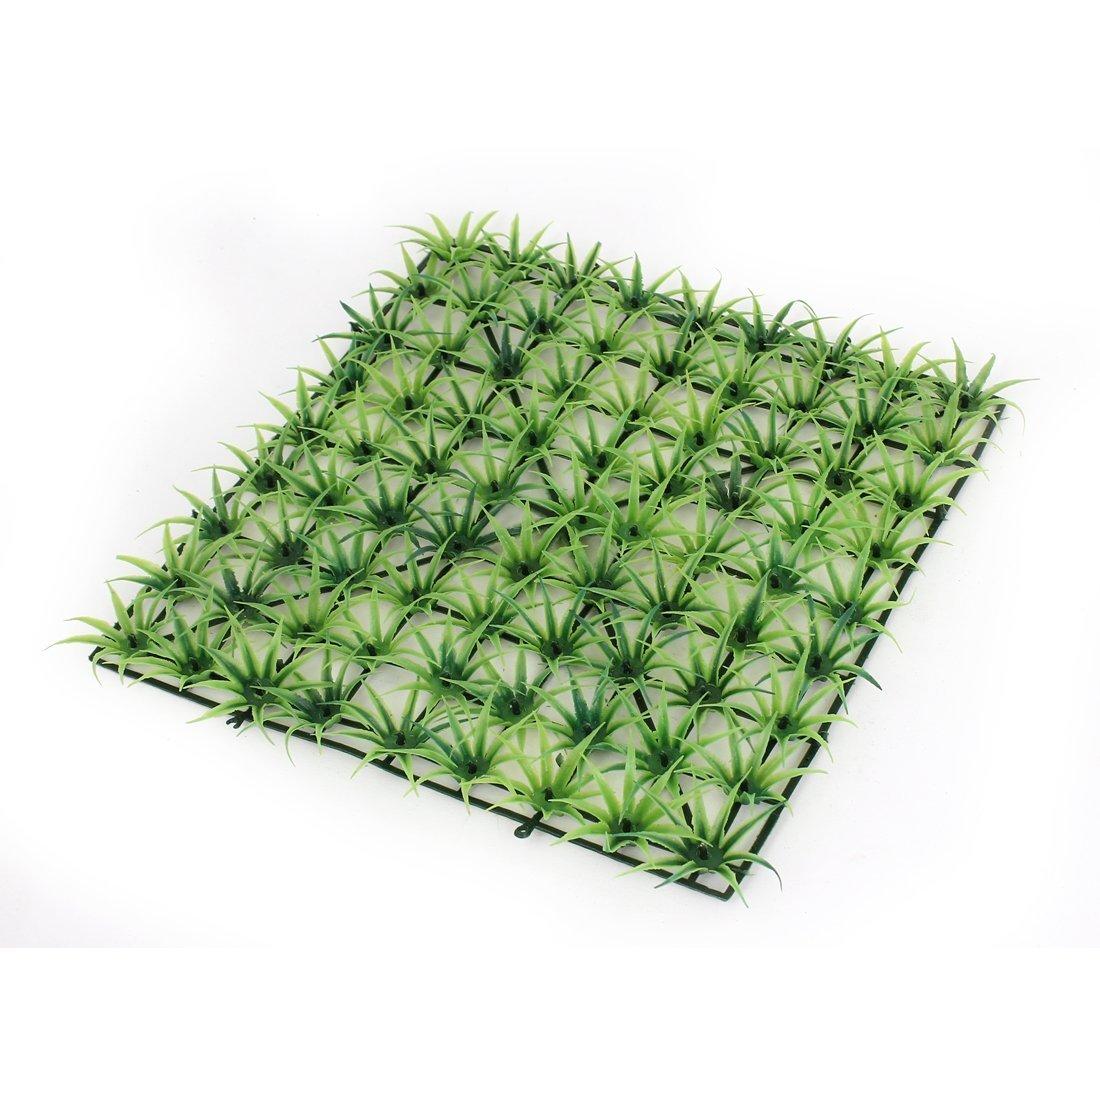 1Pc Plastic Manmade Grass Aquarium Fish Tank Lawn Plant Ornament Green